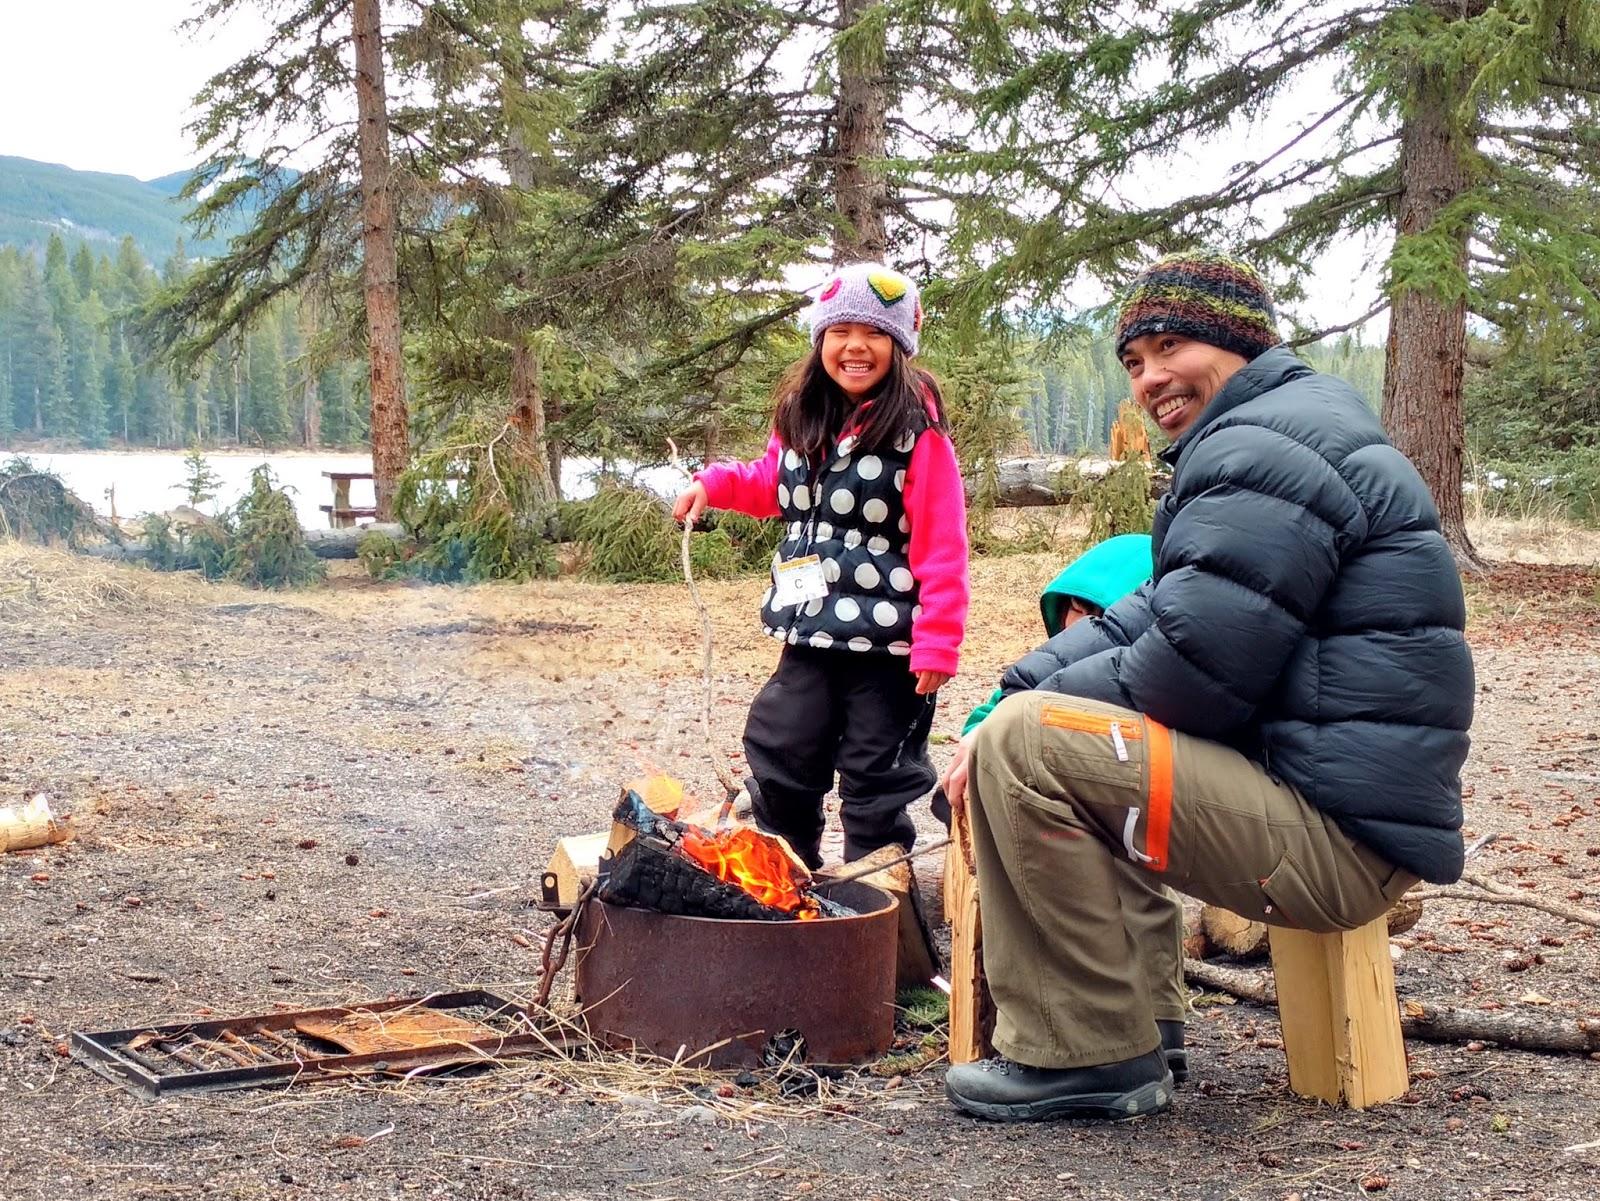 Lake Annette Day Use Area, Jasper National Park